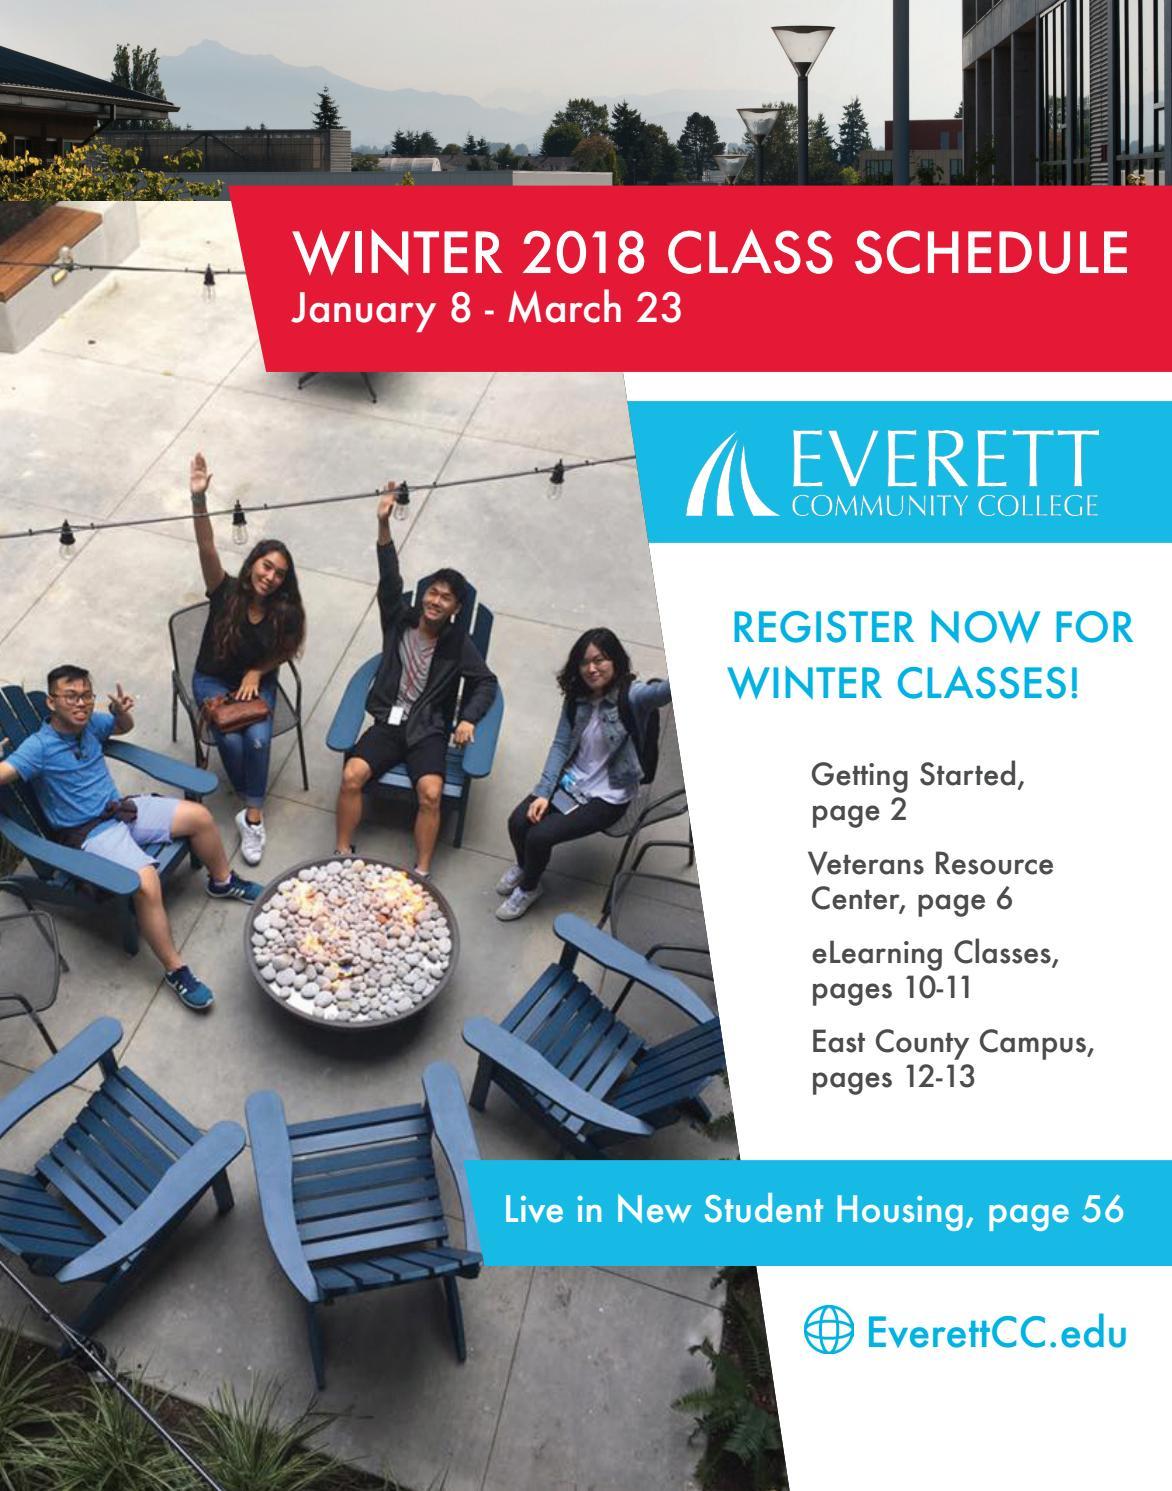 Winter 2018 Class Schedule By Everett Community College